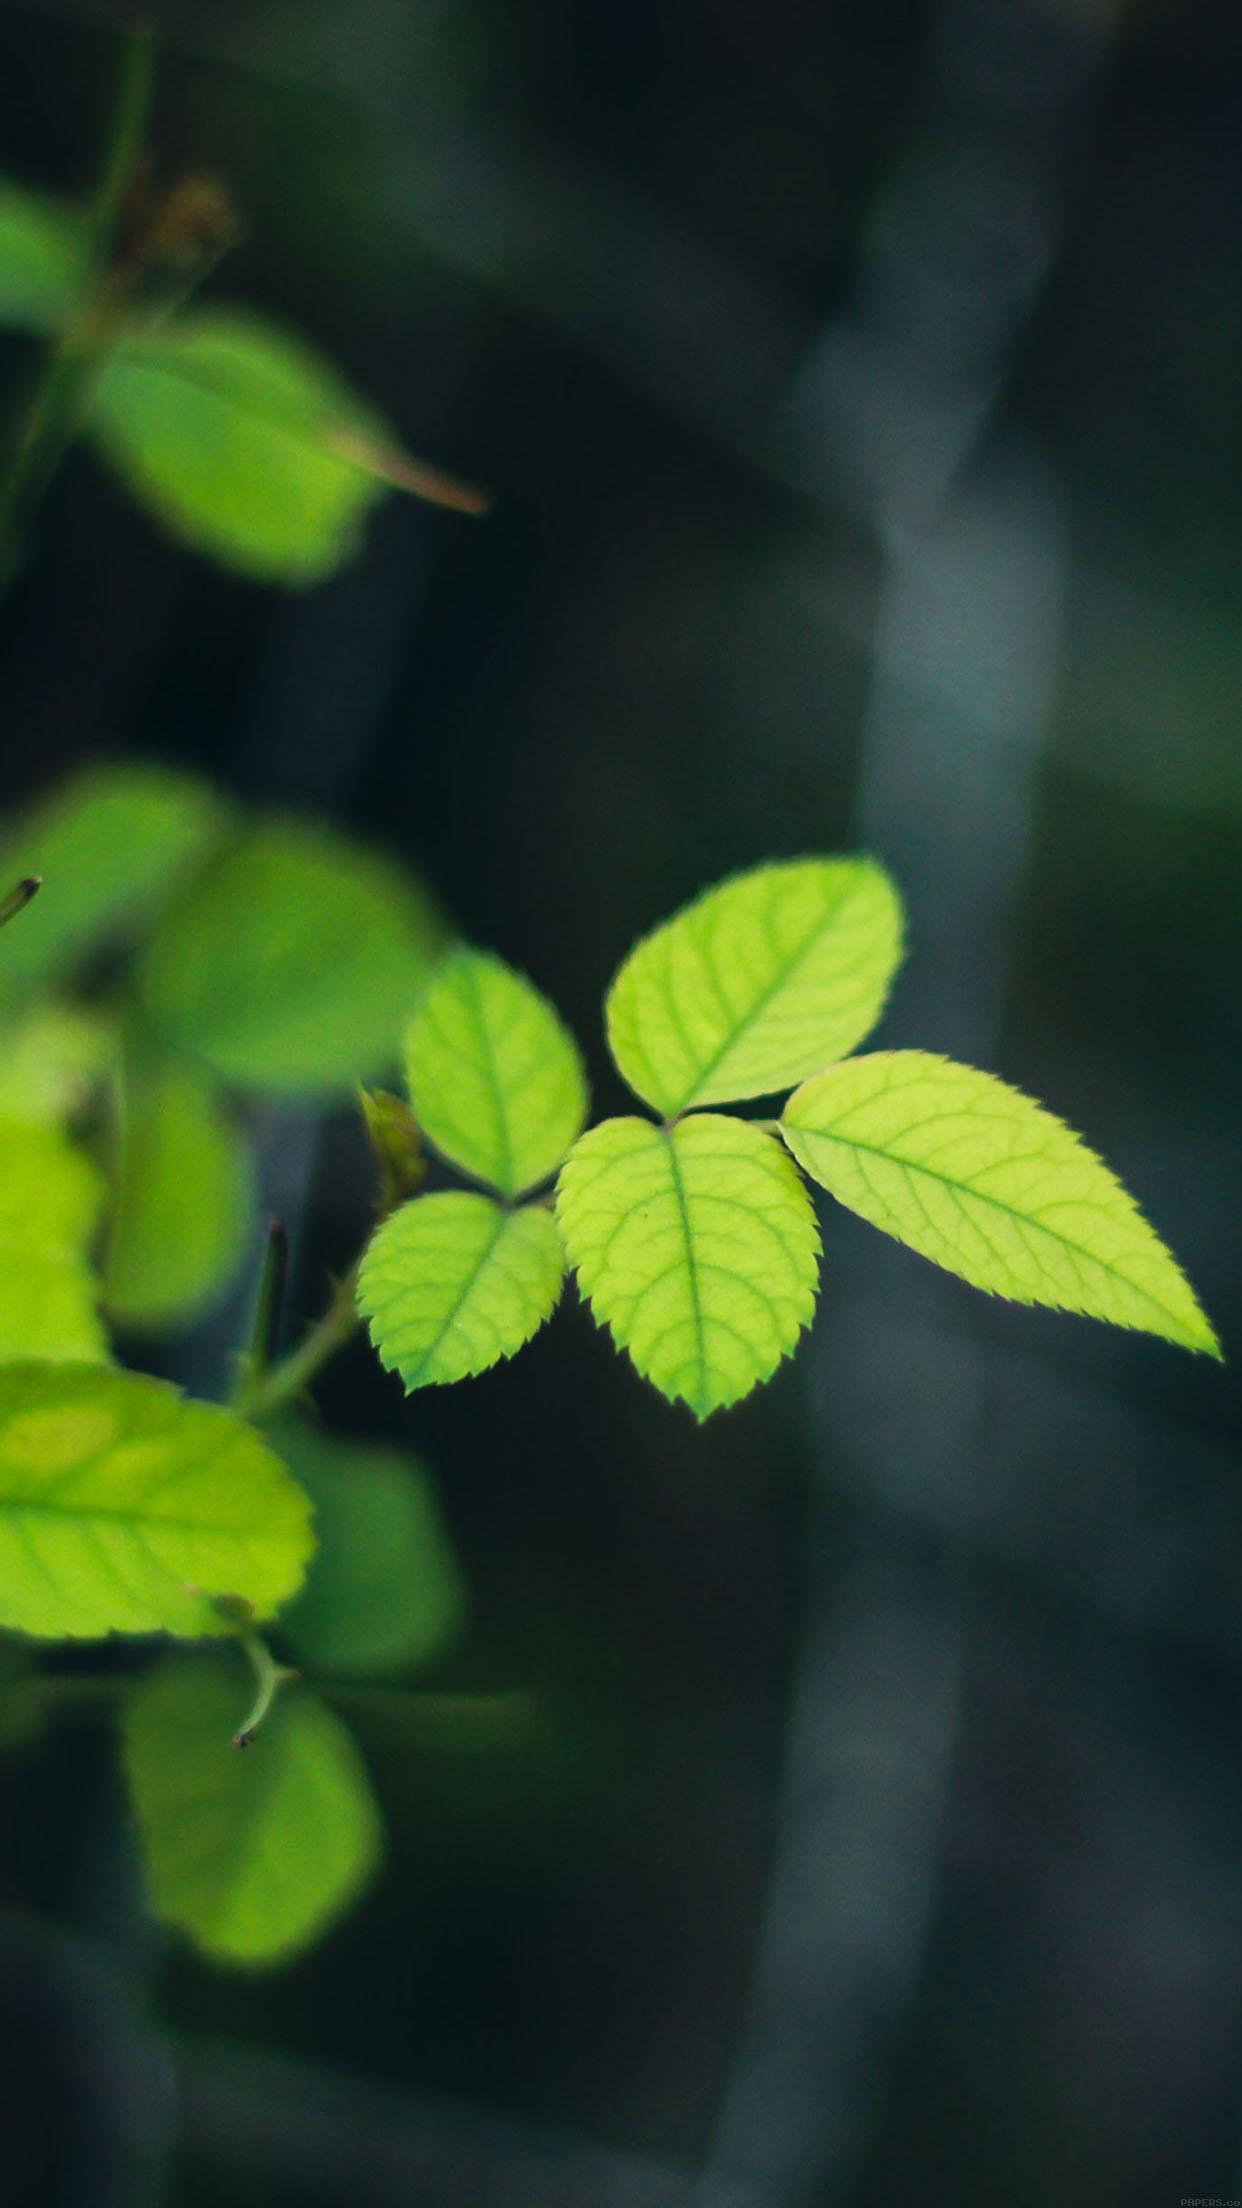 Cute Wallpaper Galaxy Note Mc00 Wallpaper Greenish Flower Leaf Papers Co